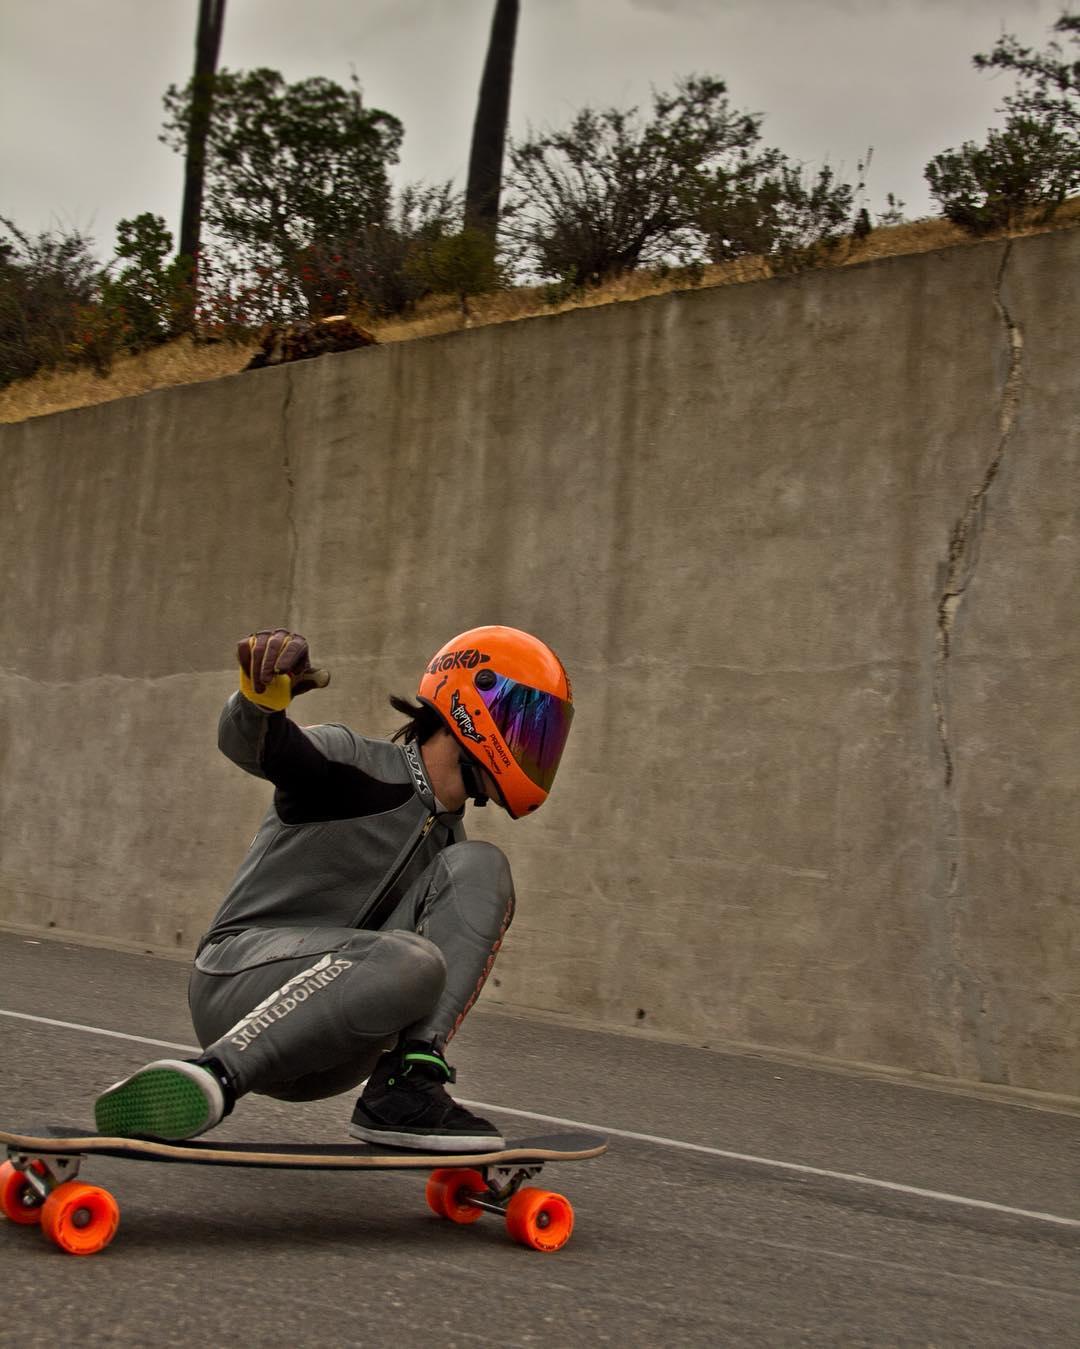 #OrangatangAmbassador and Malibu legend @kylechin sliding left at @catalinaclassic